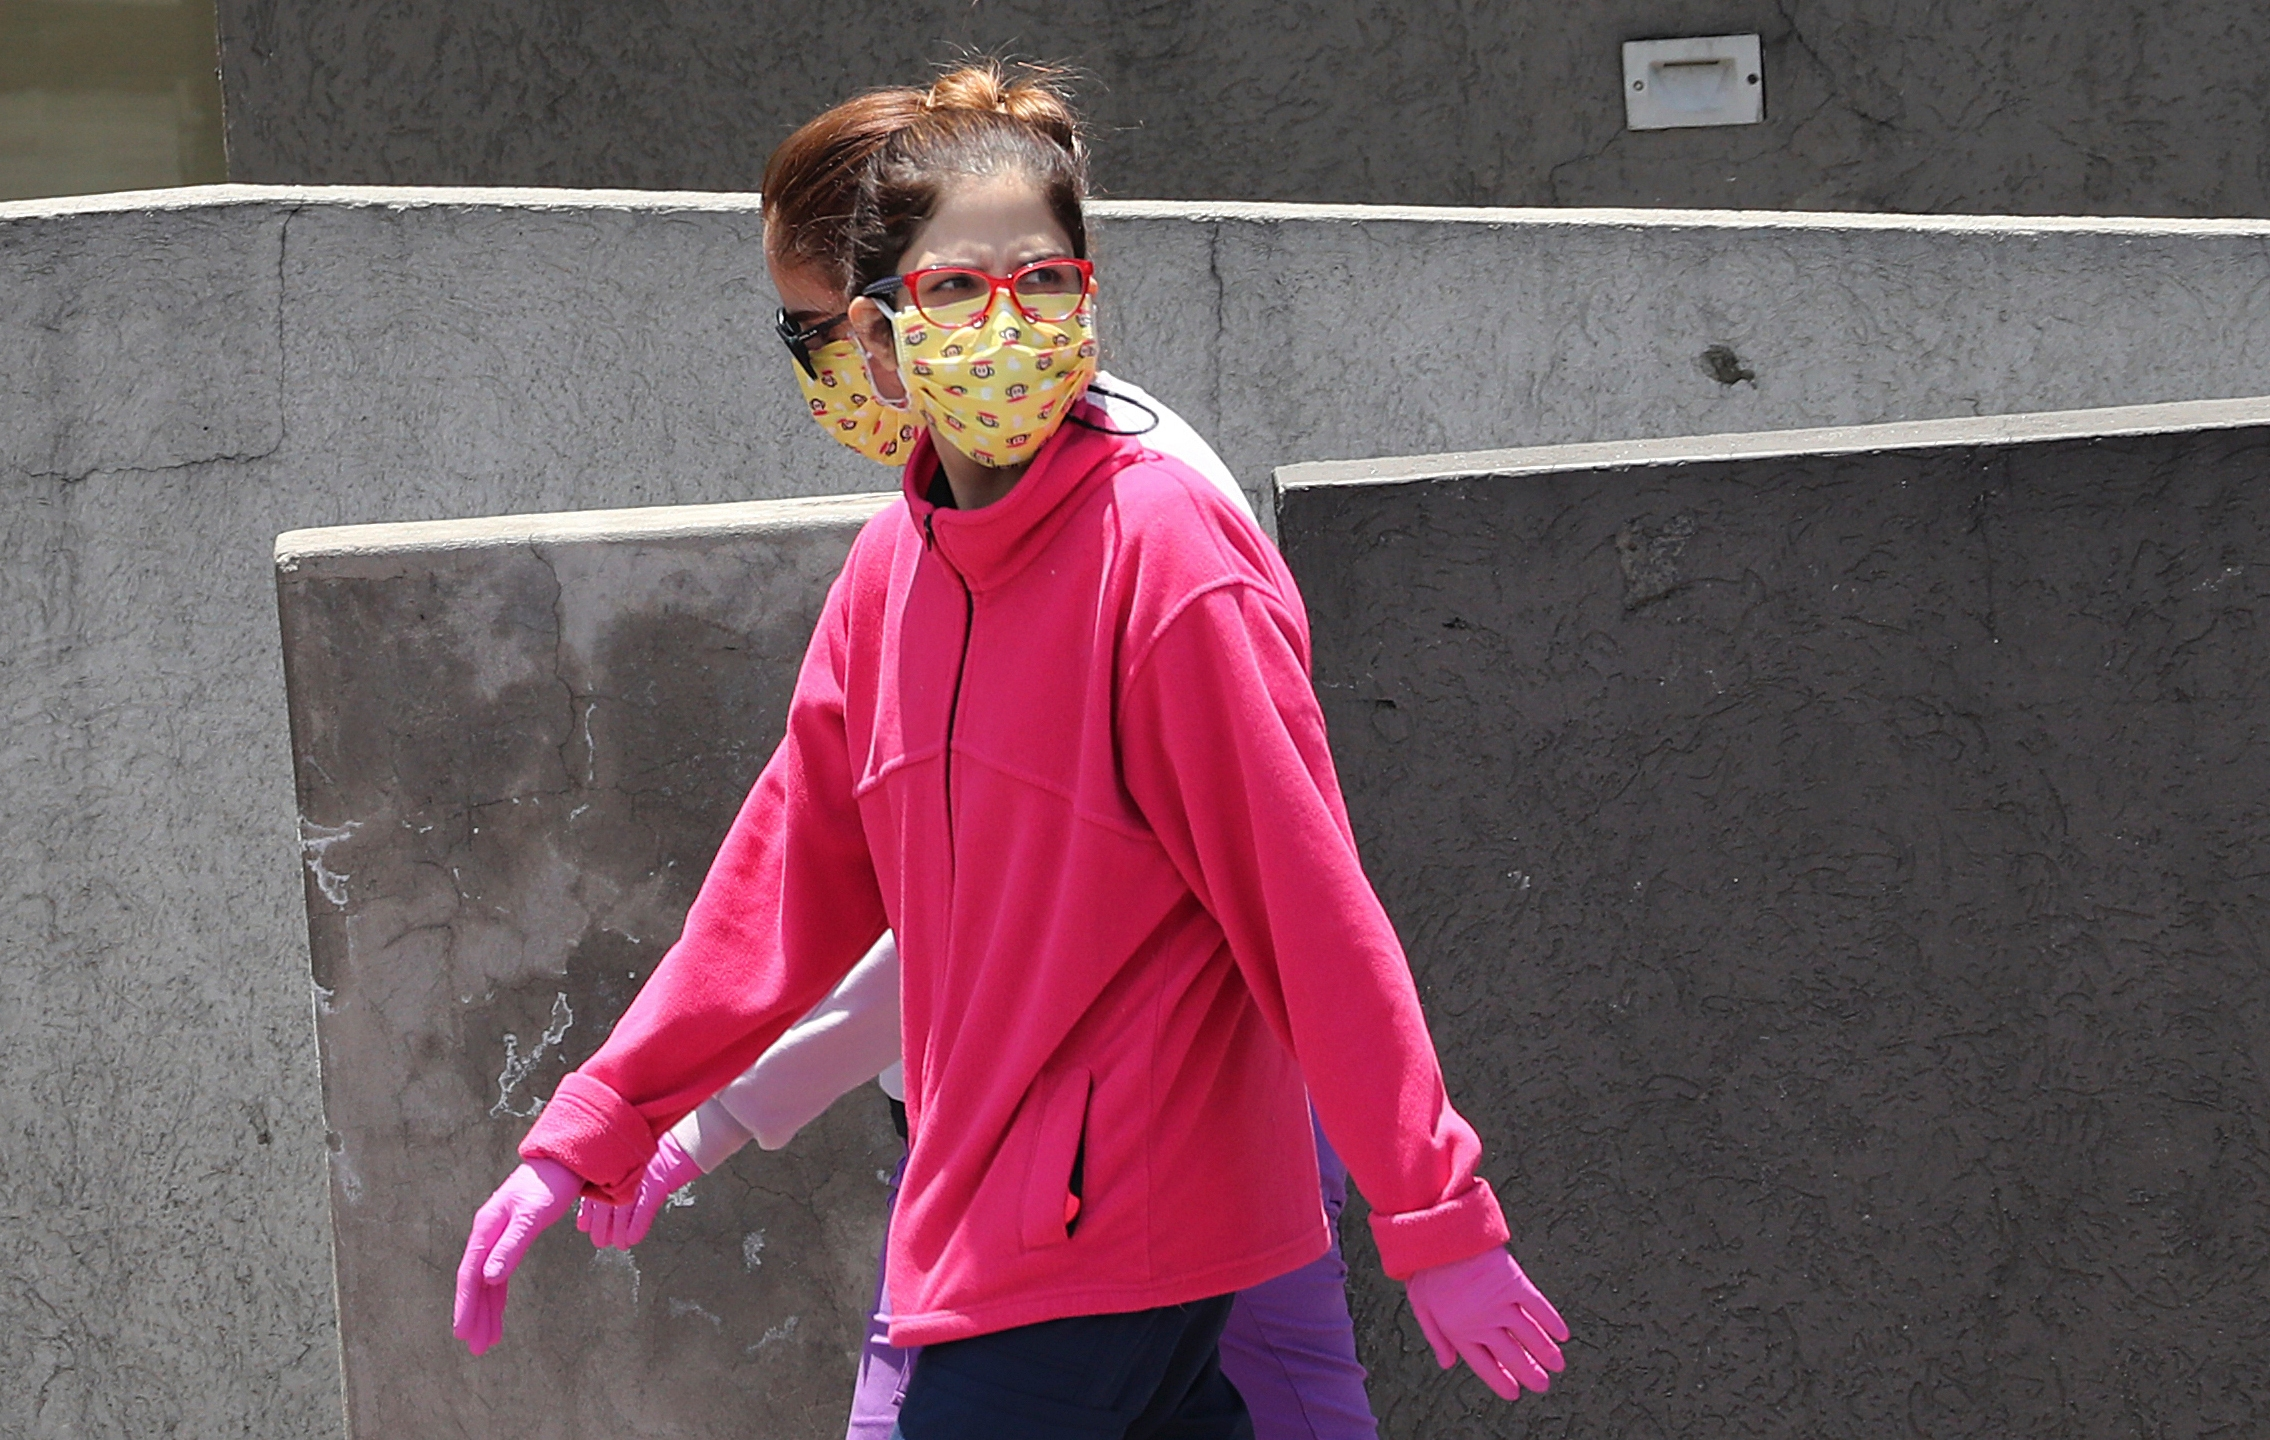 Women wear face masks and gloves as a precaution against the spread of the new coronavirus, in Quito, Ecuador on Thursday. (AP Photo/Dolores Ochoa)